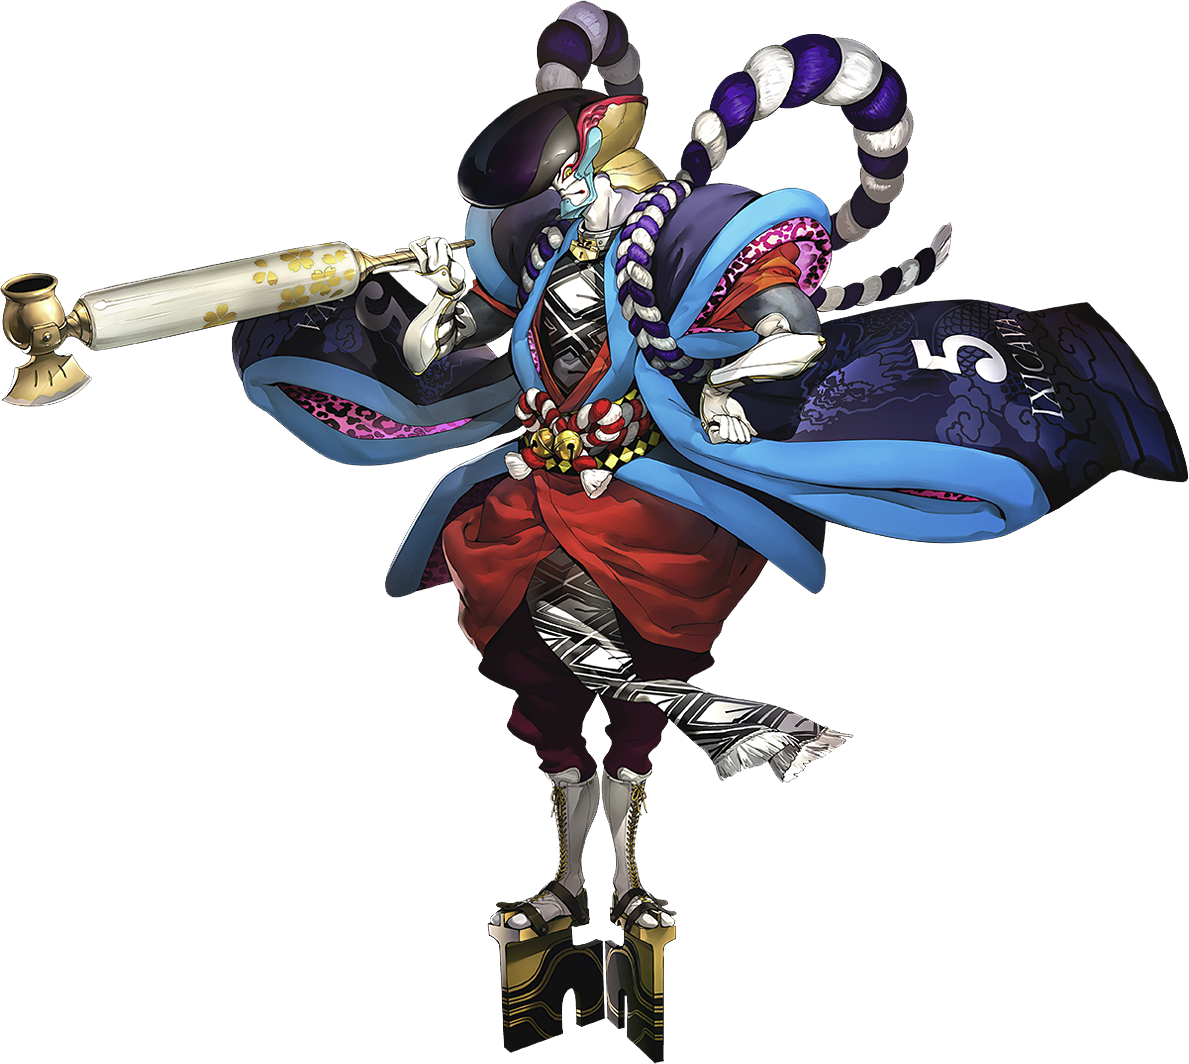 Goemon | Persona 5, Character design, Persona